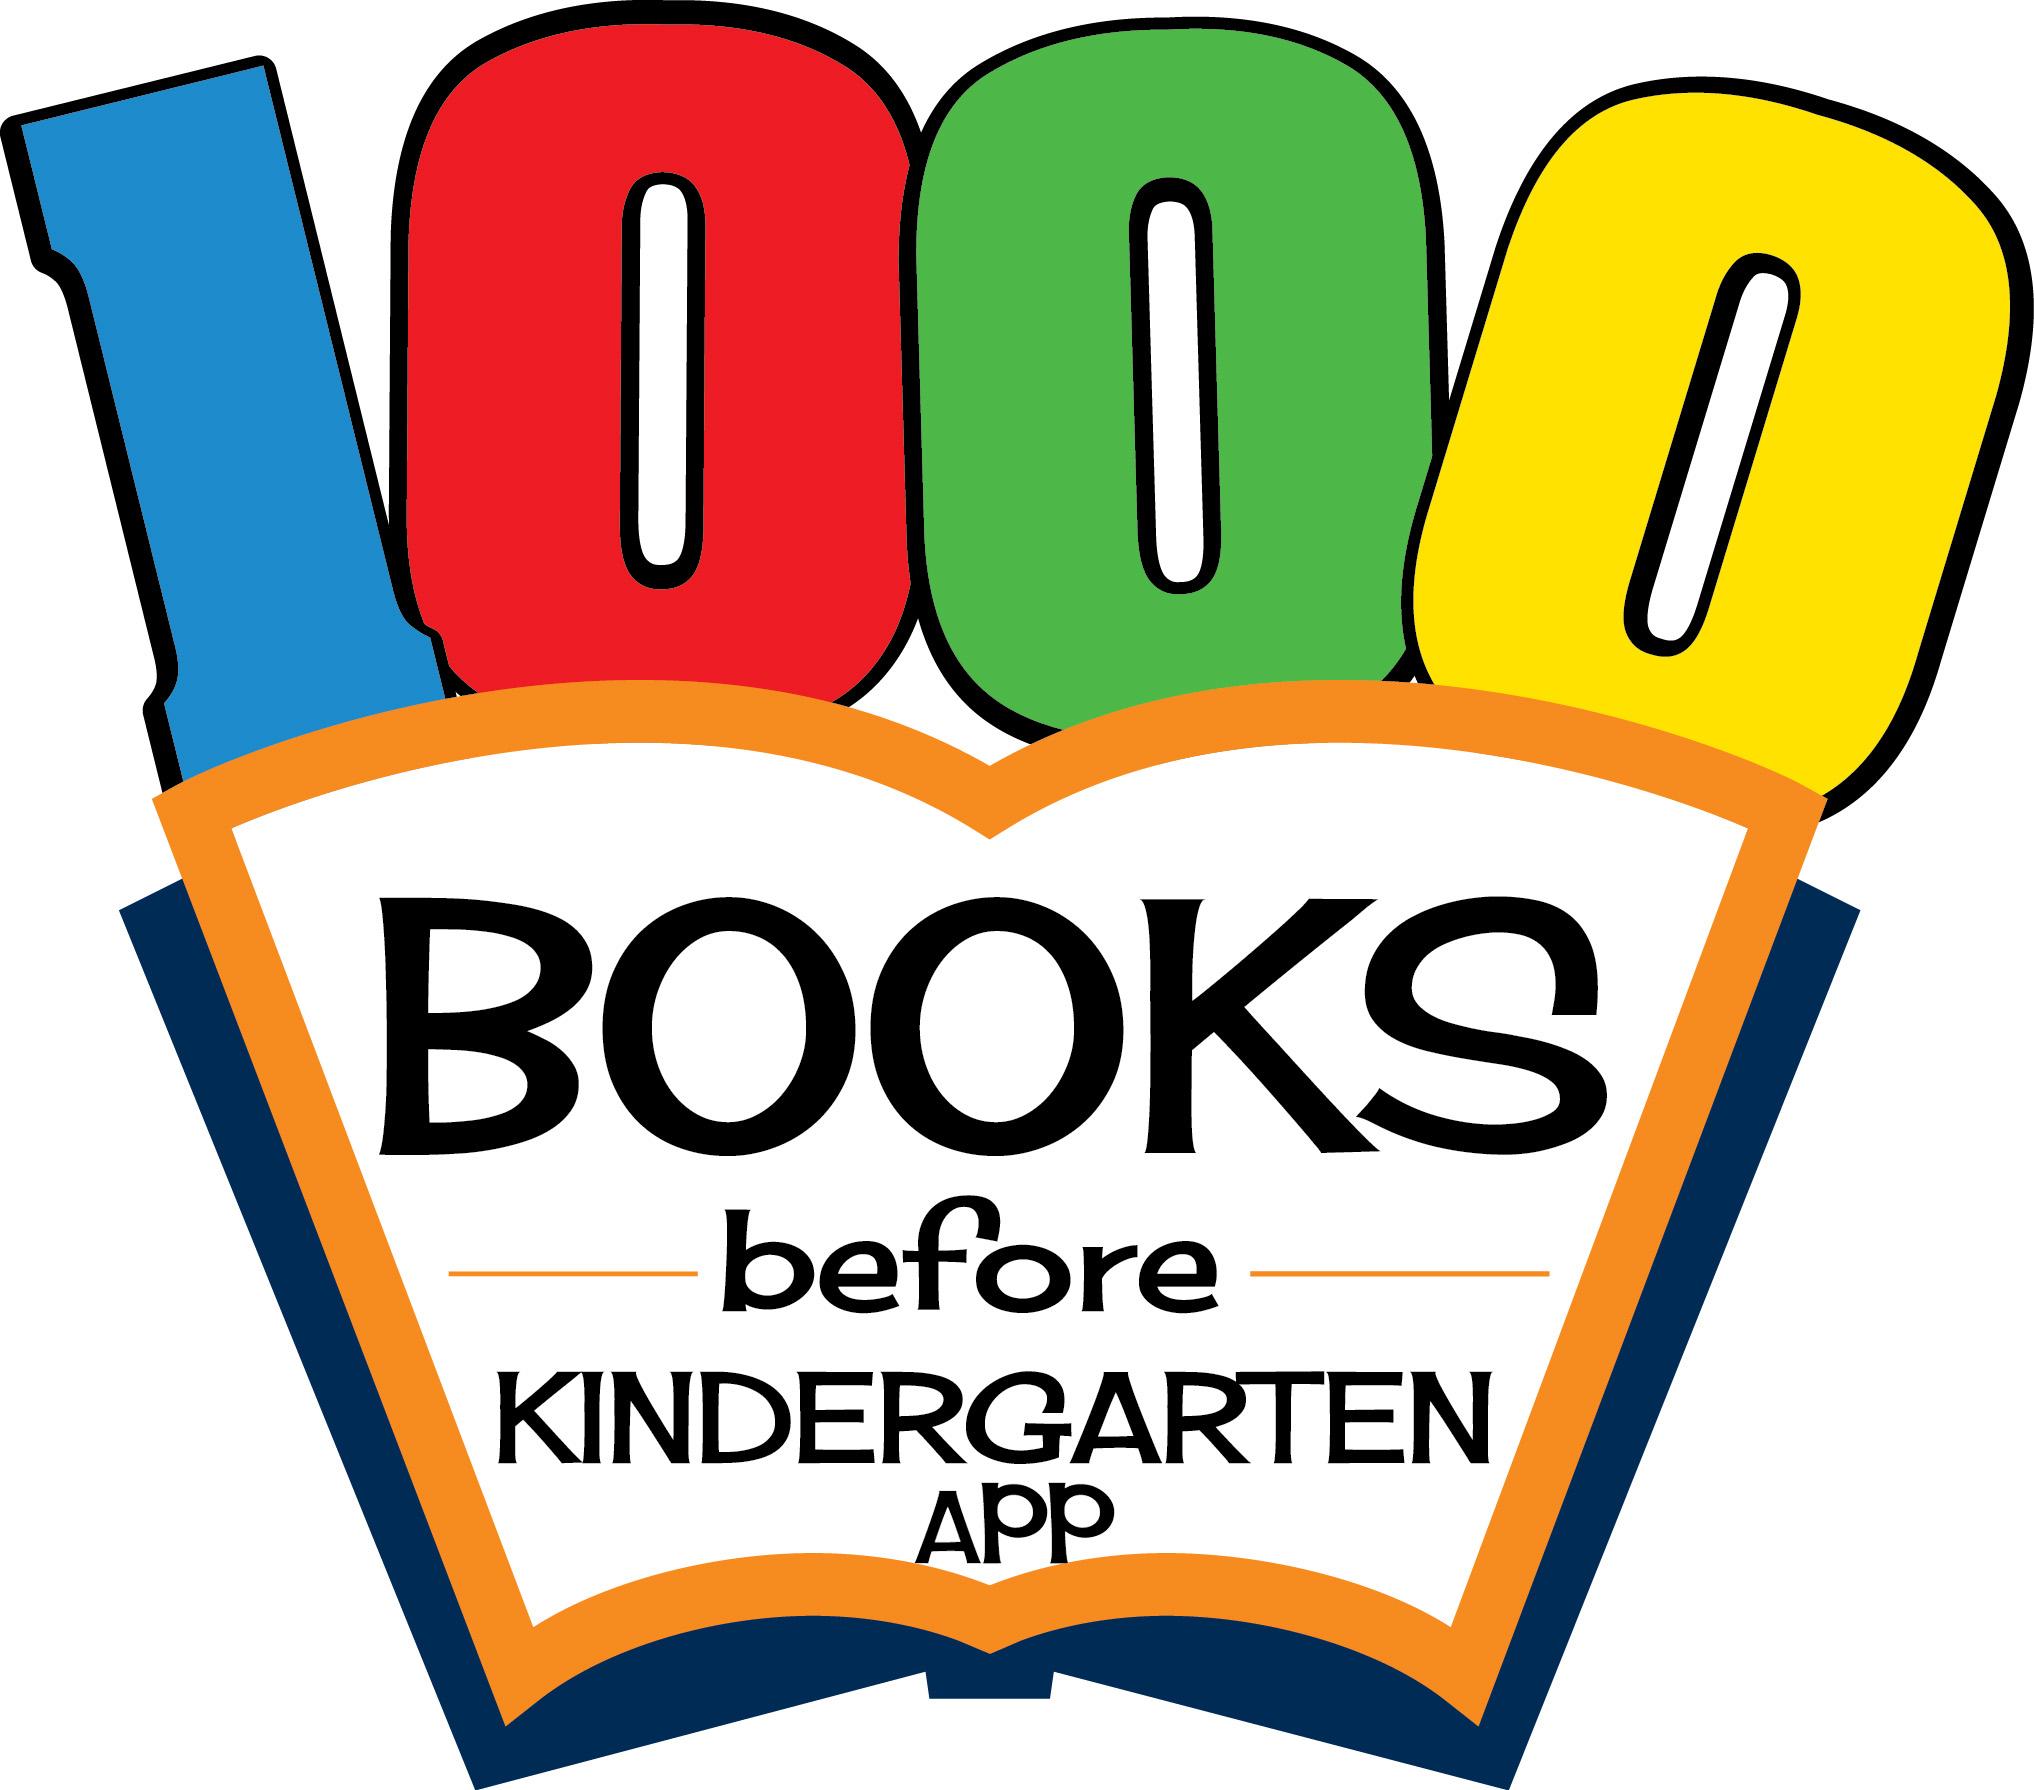 1000 Books Before Kindergarten Toolkits.